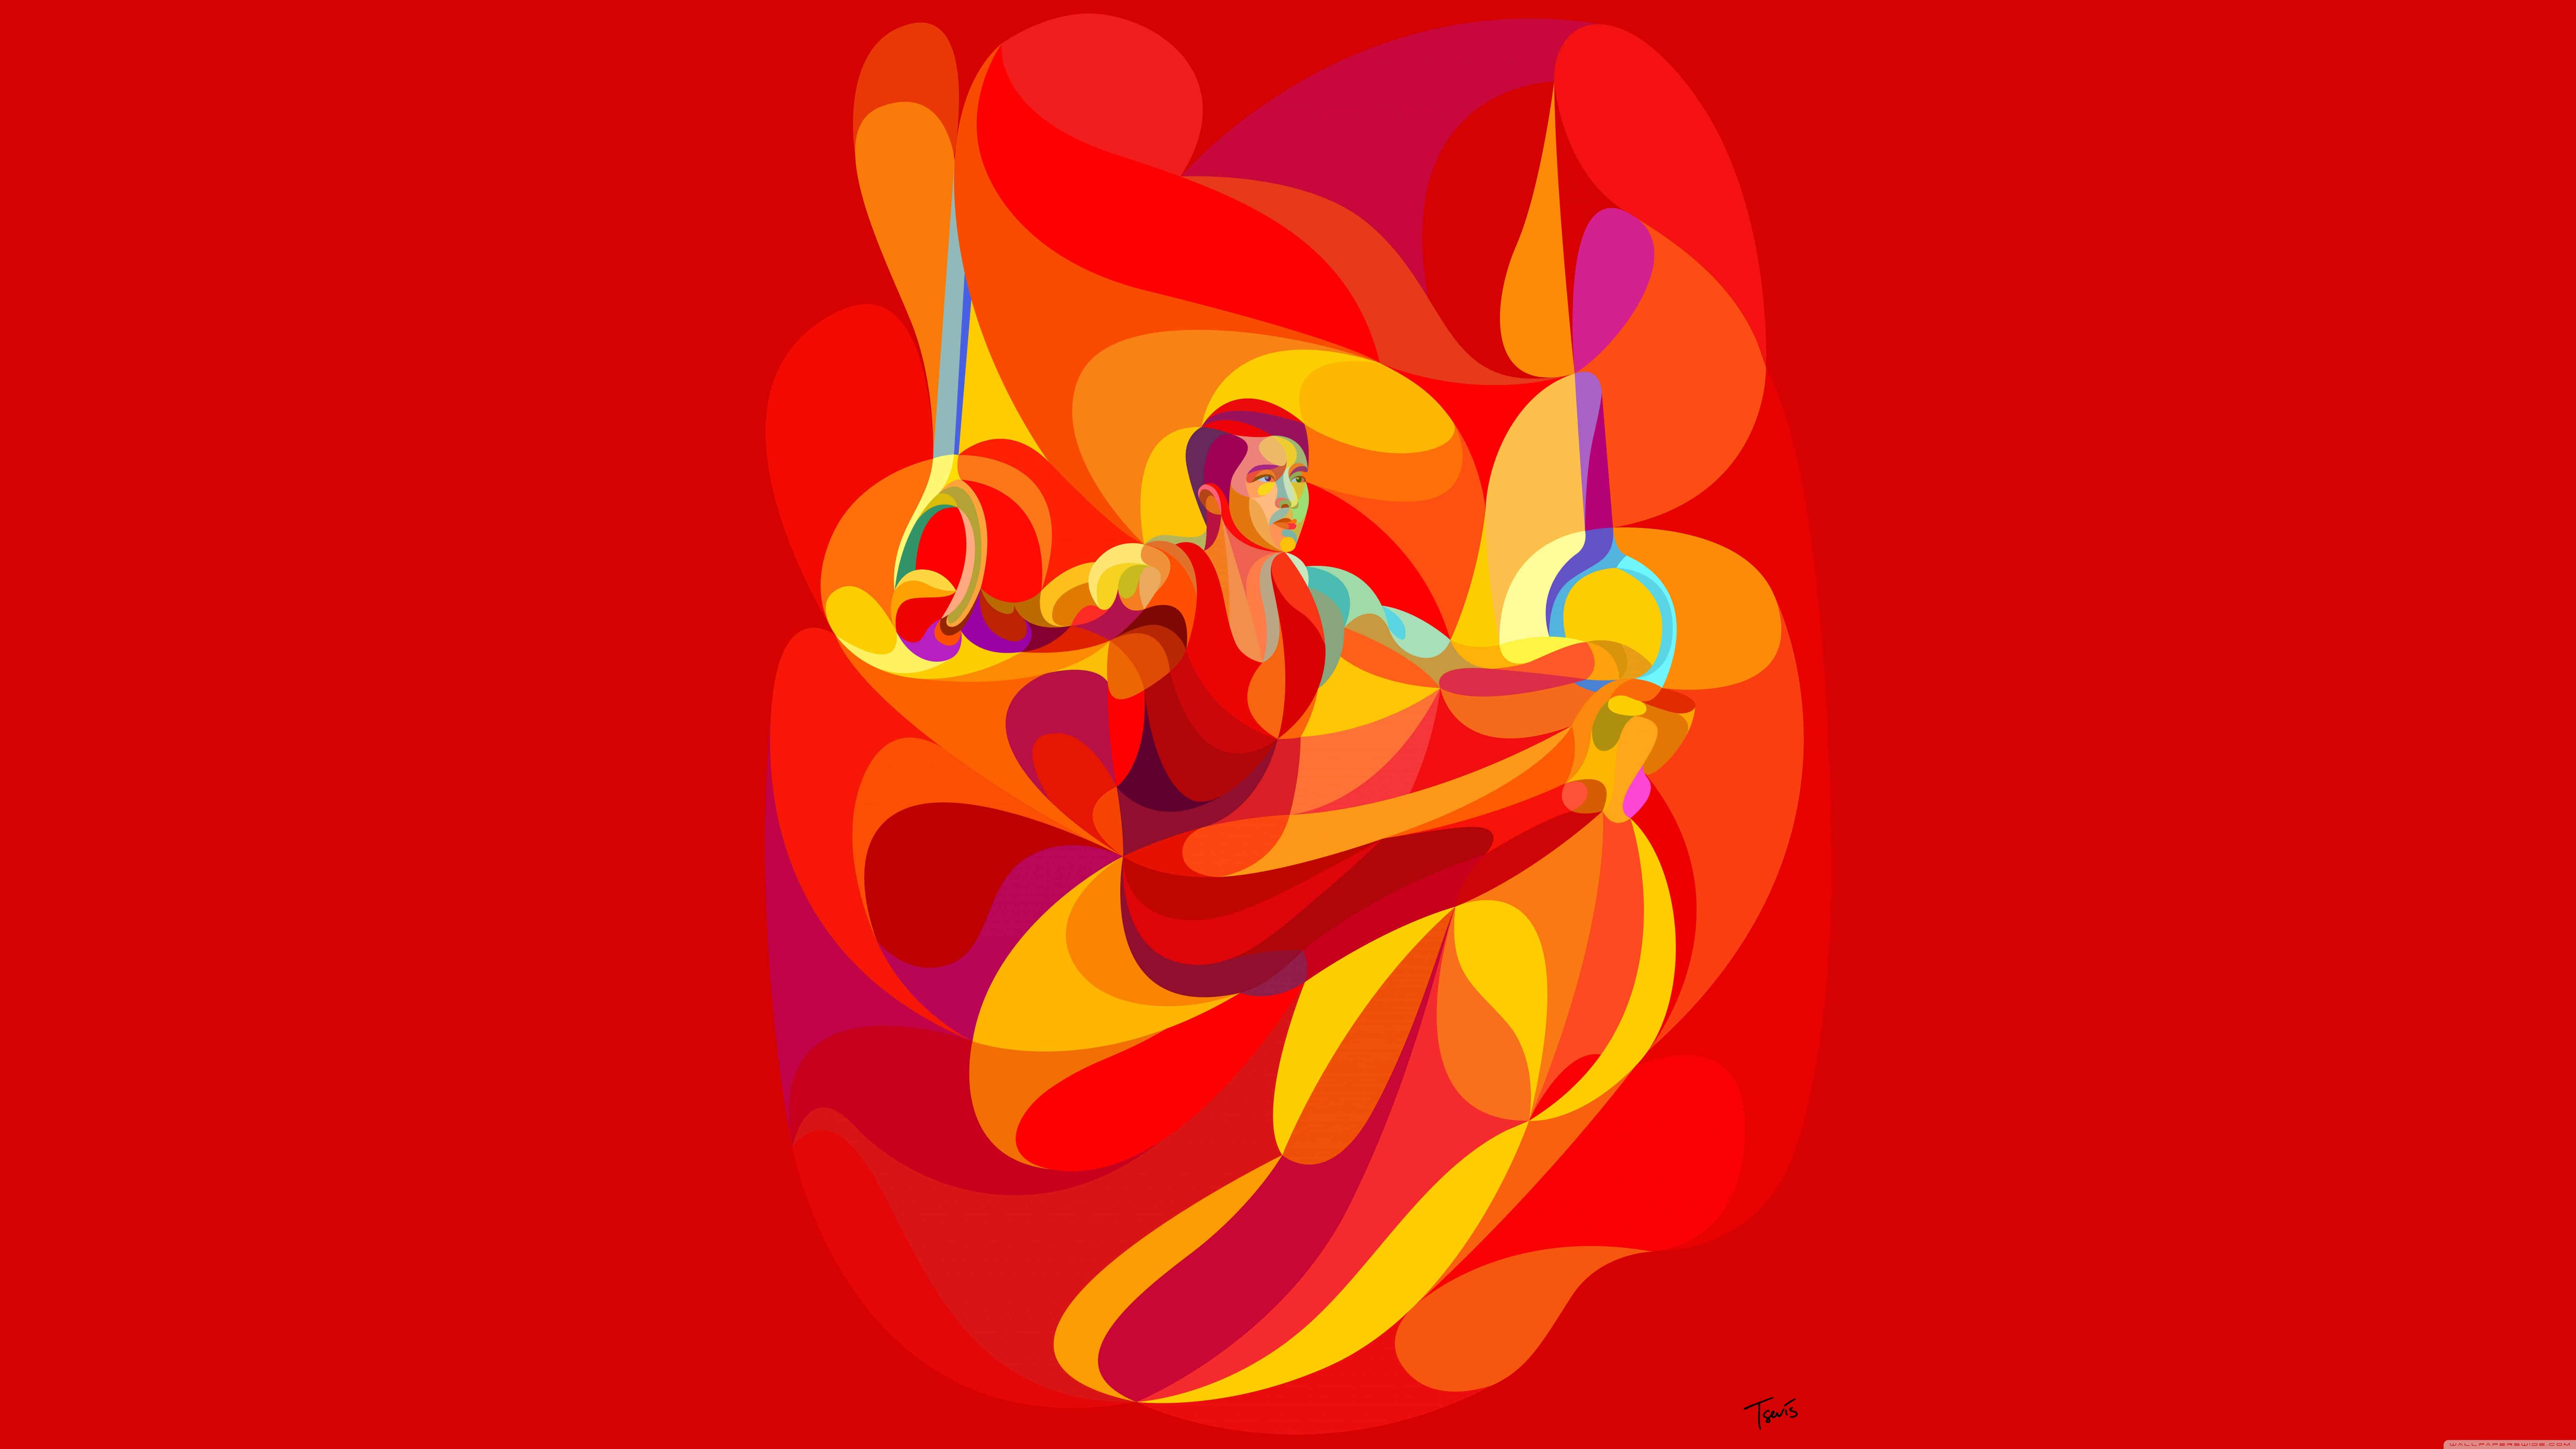 olympics gymnastics uhd 8k wallpaper